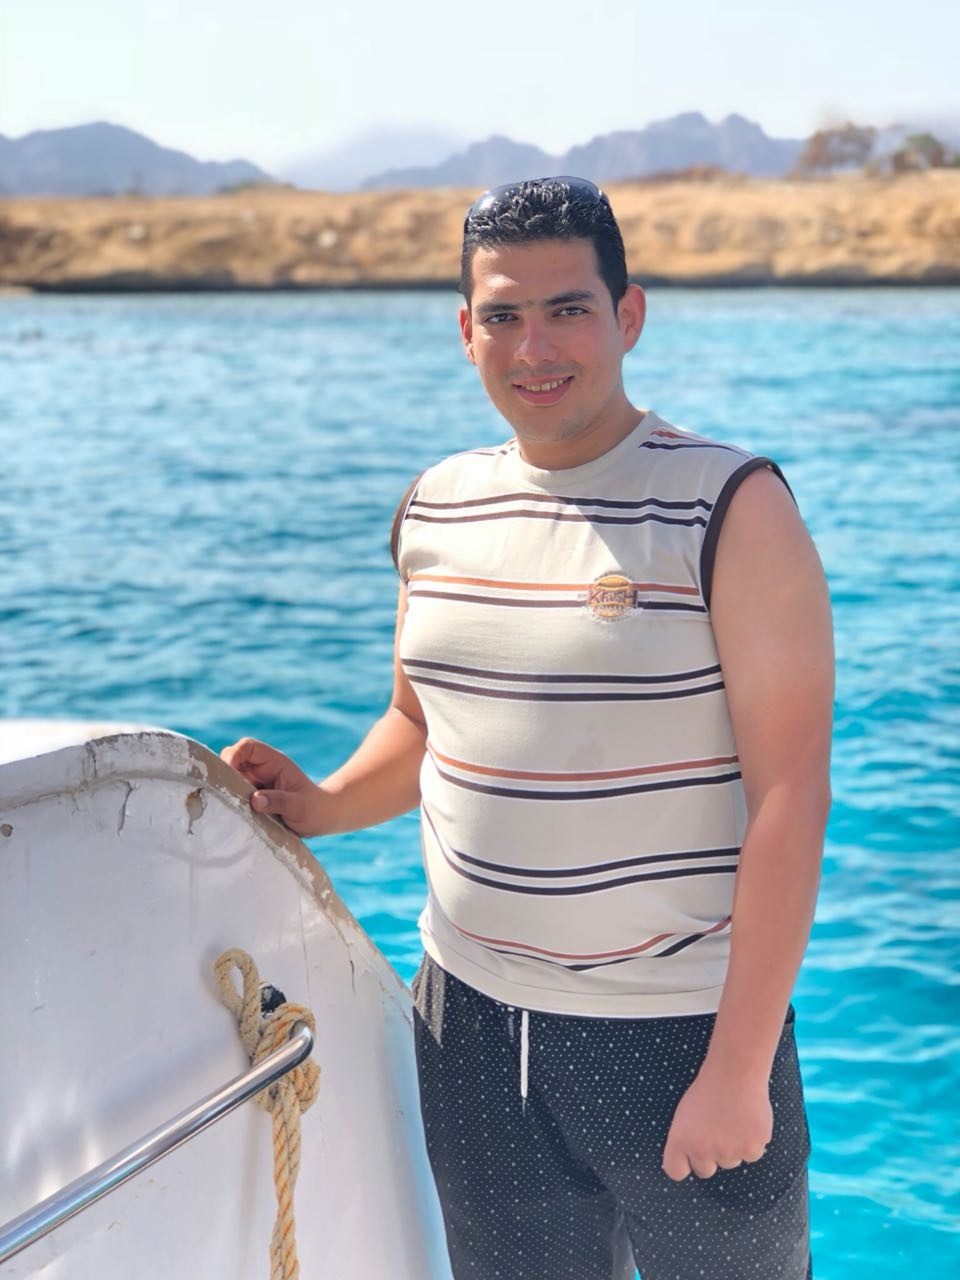 Swimming  by Abdelghany salah